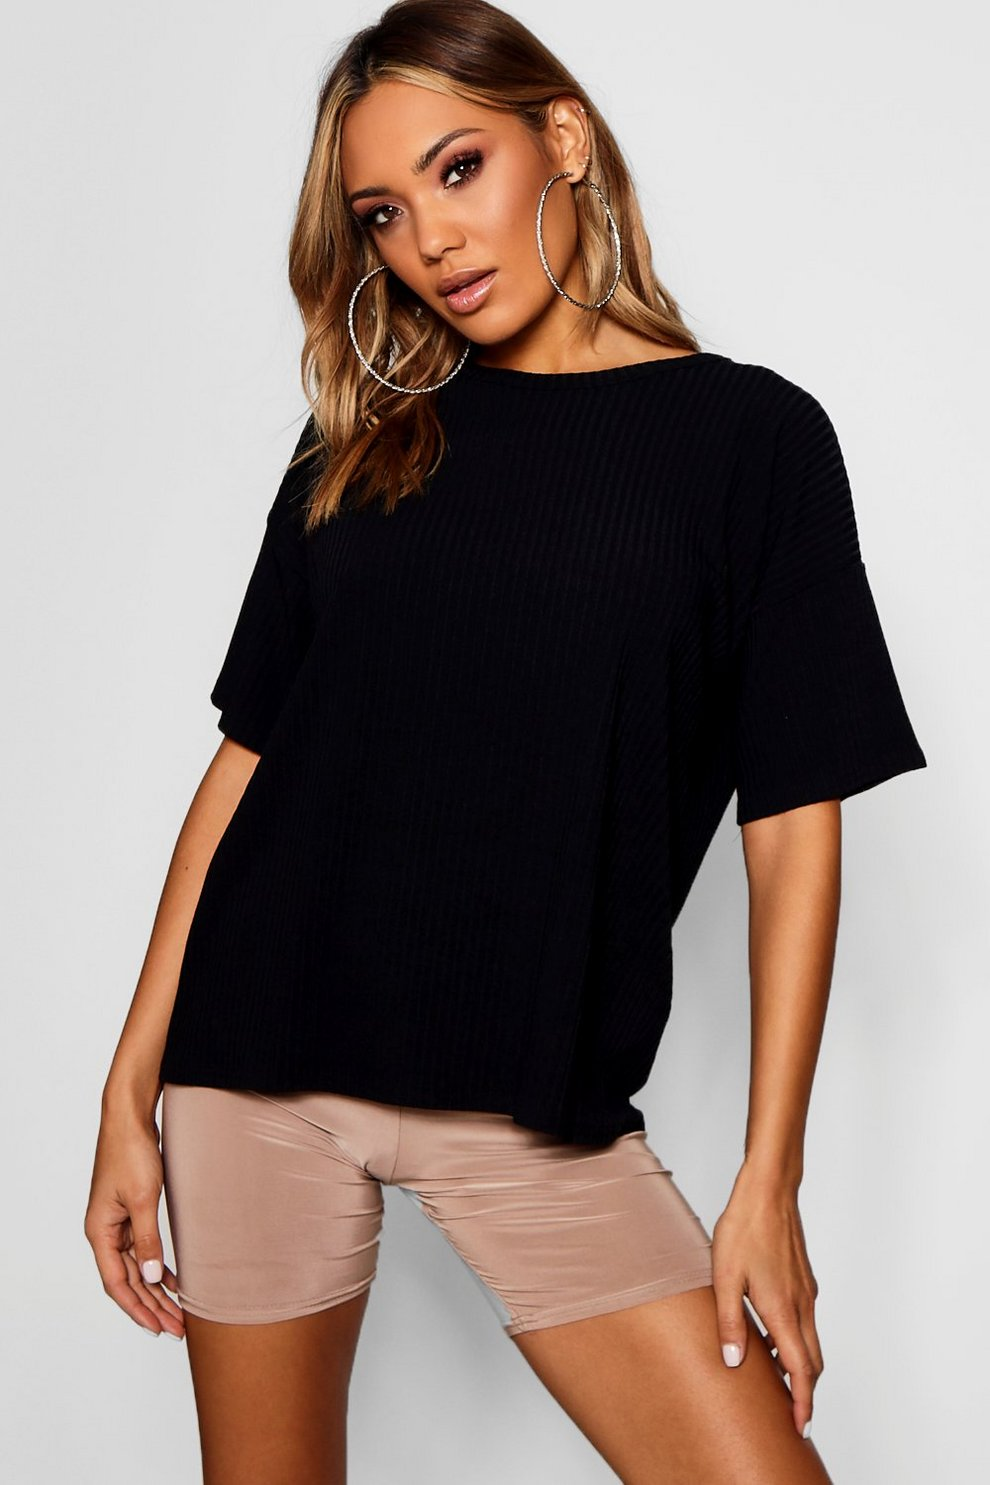 Boohoo Oversized Boxy Rib Knit T-Shirt Reliable Cheap Price 80X1NNc2CZ